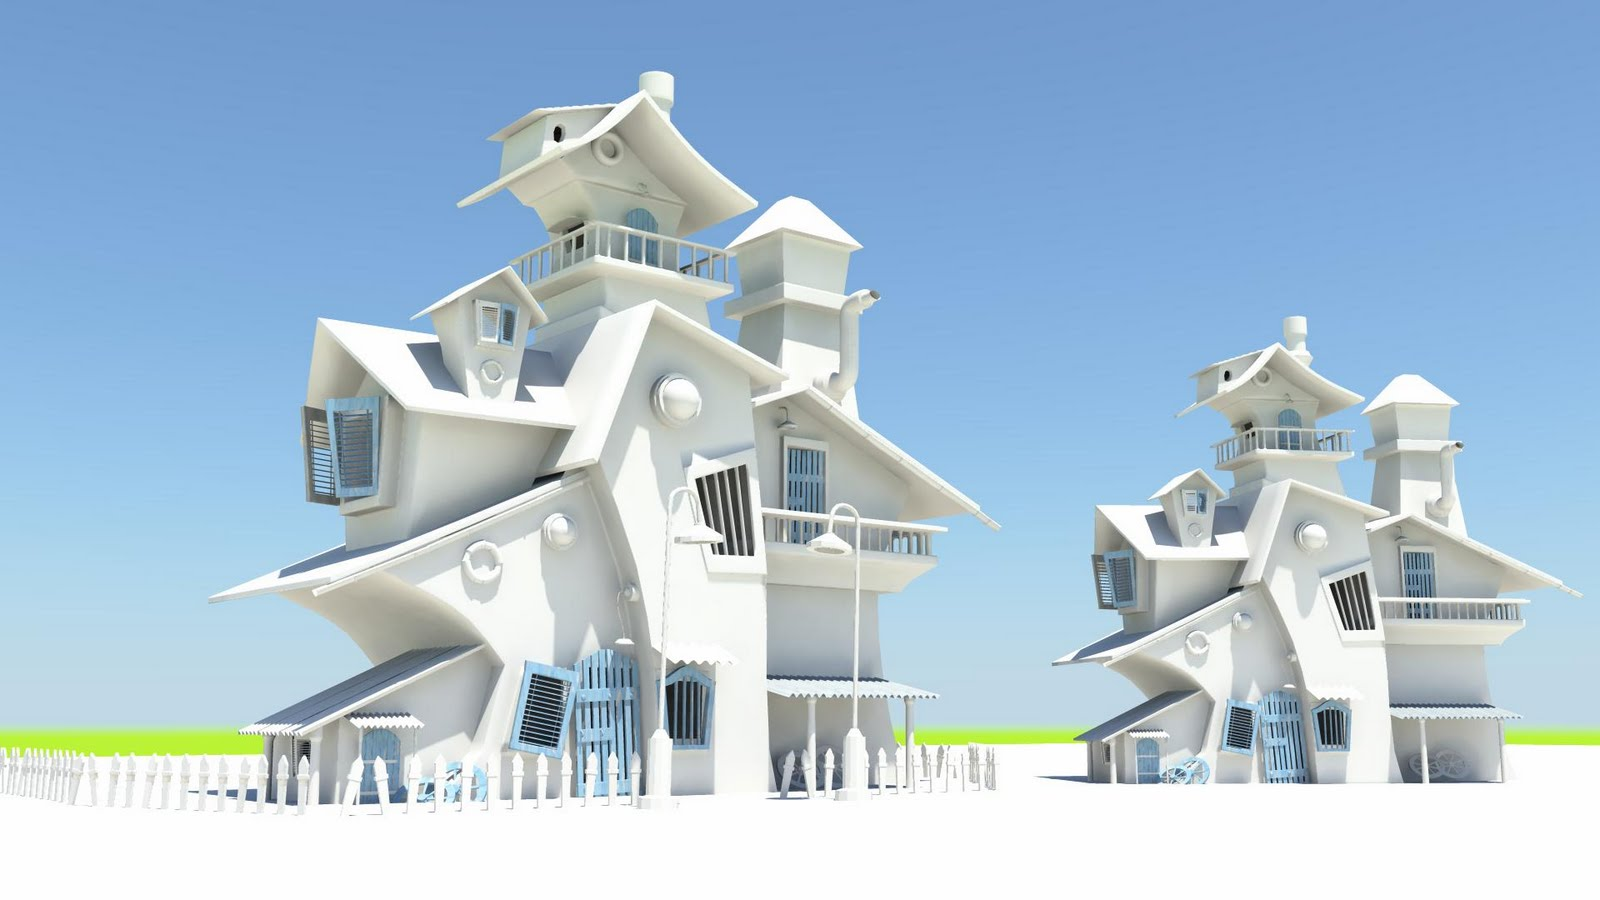 PIKKAR WORKS Maya catoon House model